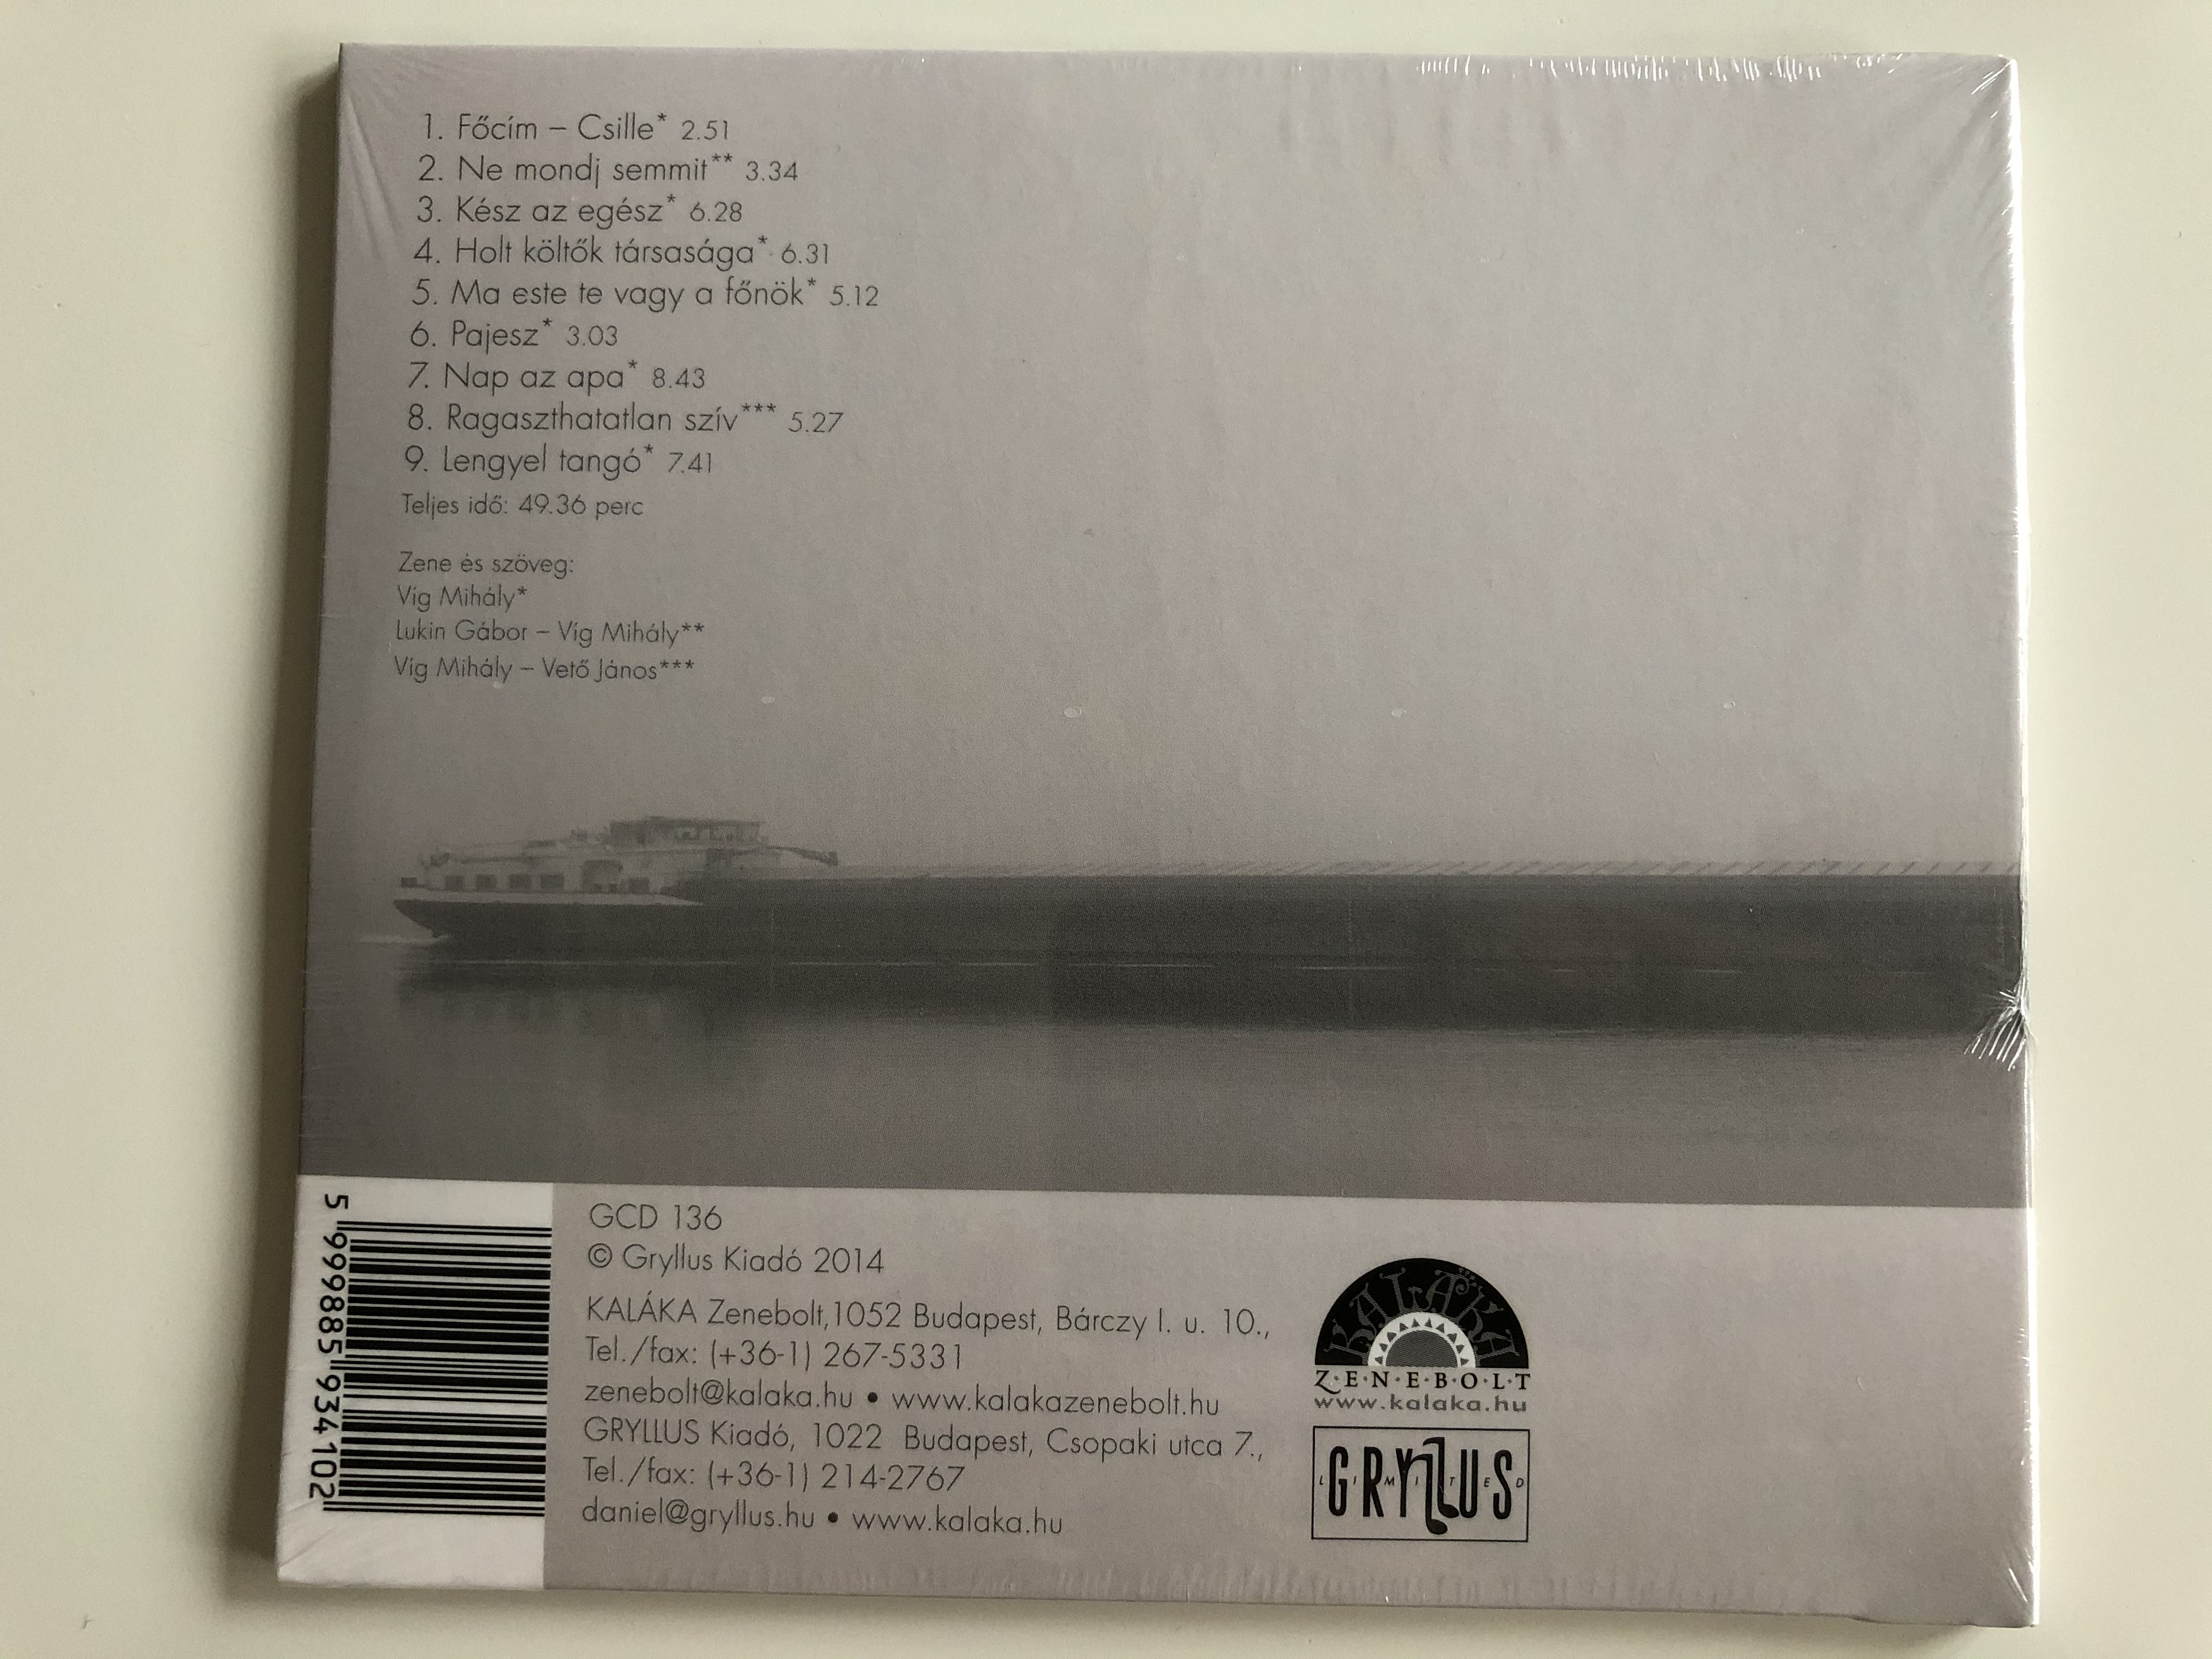 lengyel-tang-v-g-mih-ly-dalai-goston-orchestra-lakatos-monika-lovasi-andras-polya-bea-szaloki-agi-vig-mihaly-gryllus-audio-cd-2014-gcd-136-2-.jpg